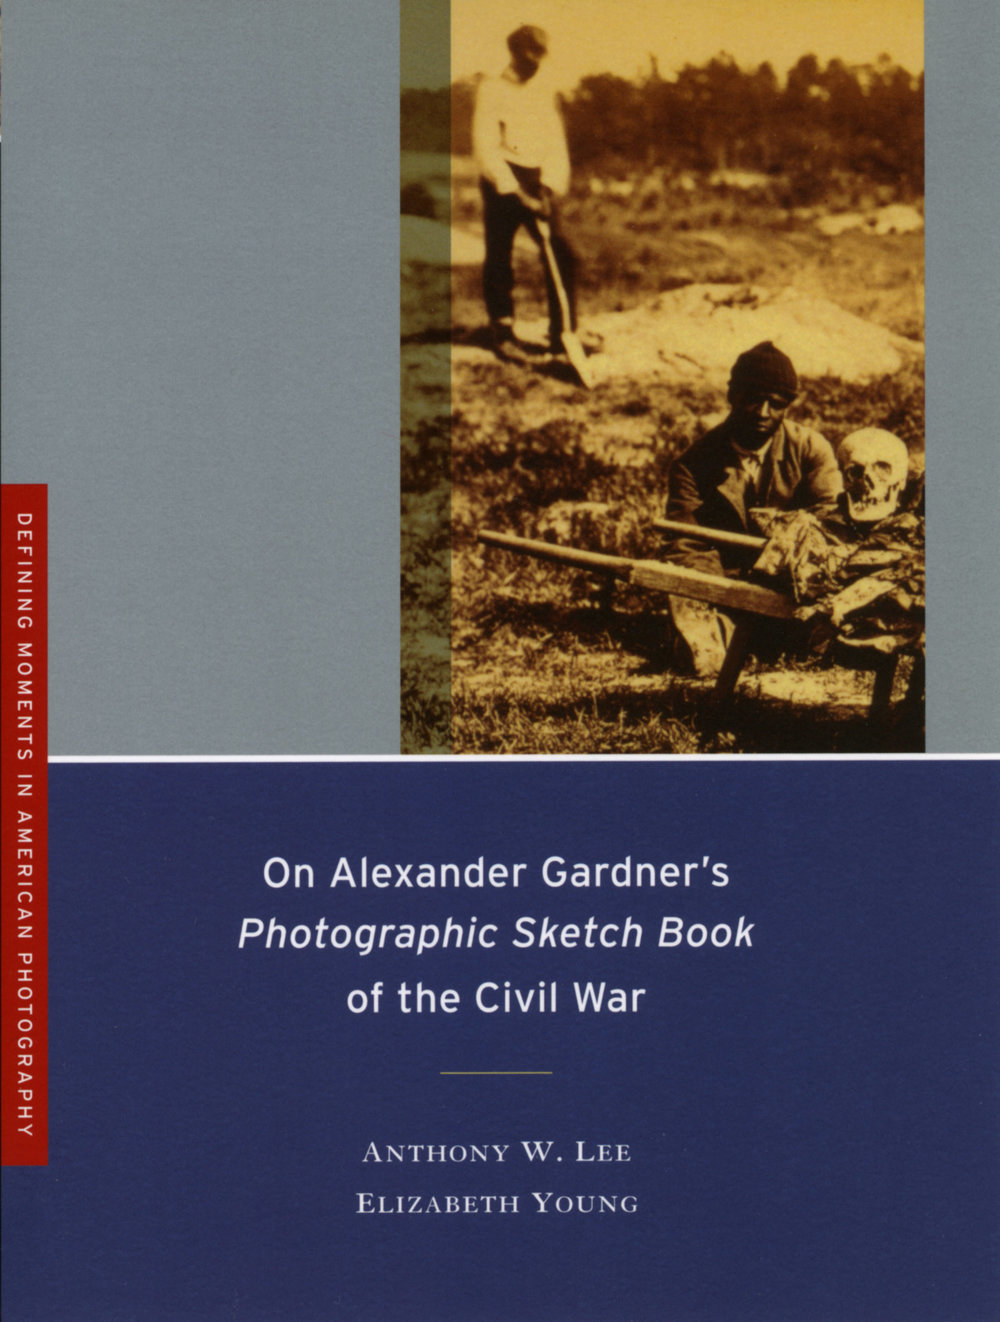 DMAP-on-alexander-gardners-photographic-sketchbook-of-the-civil-war.jpg